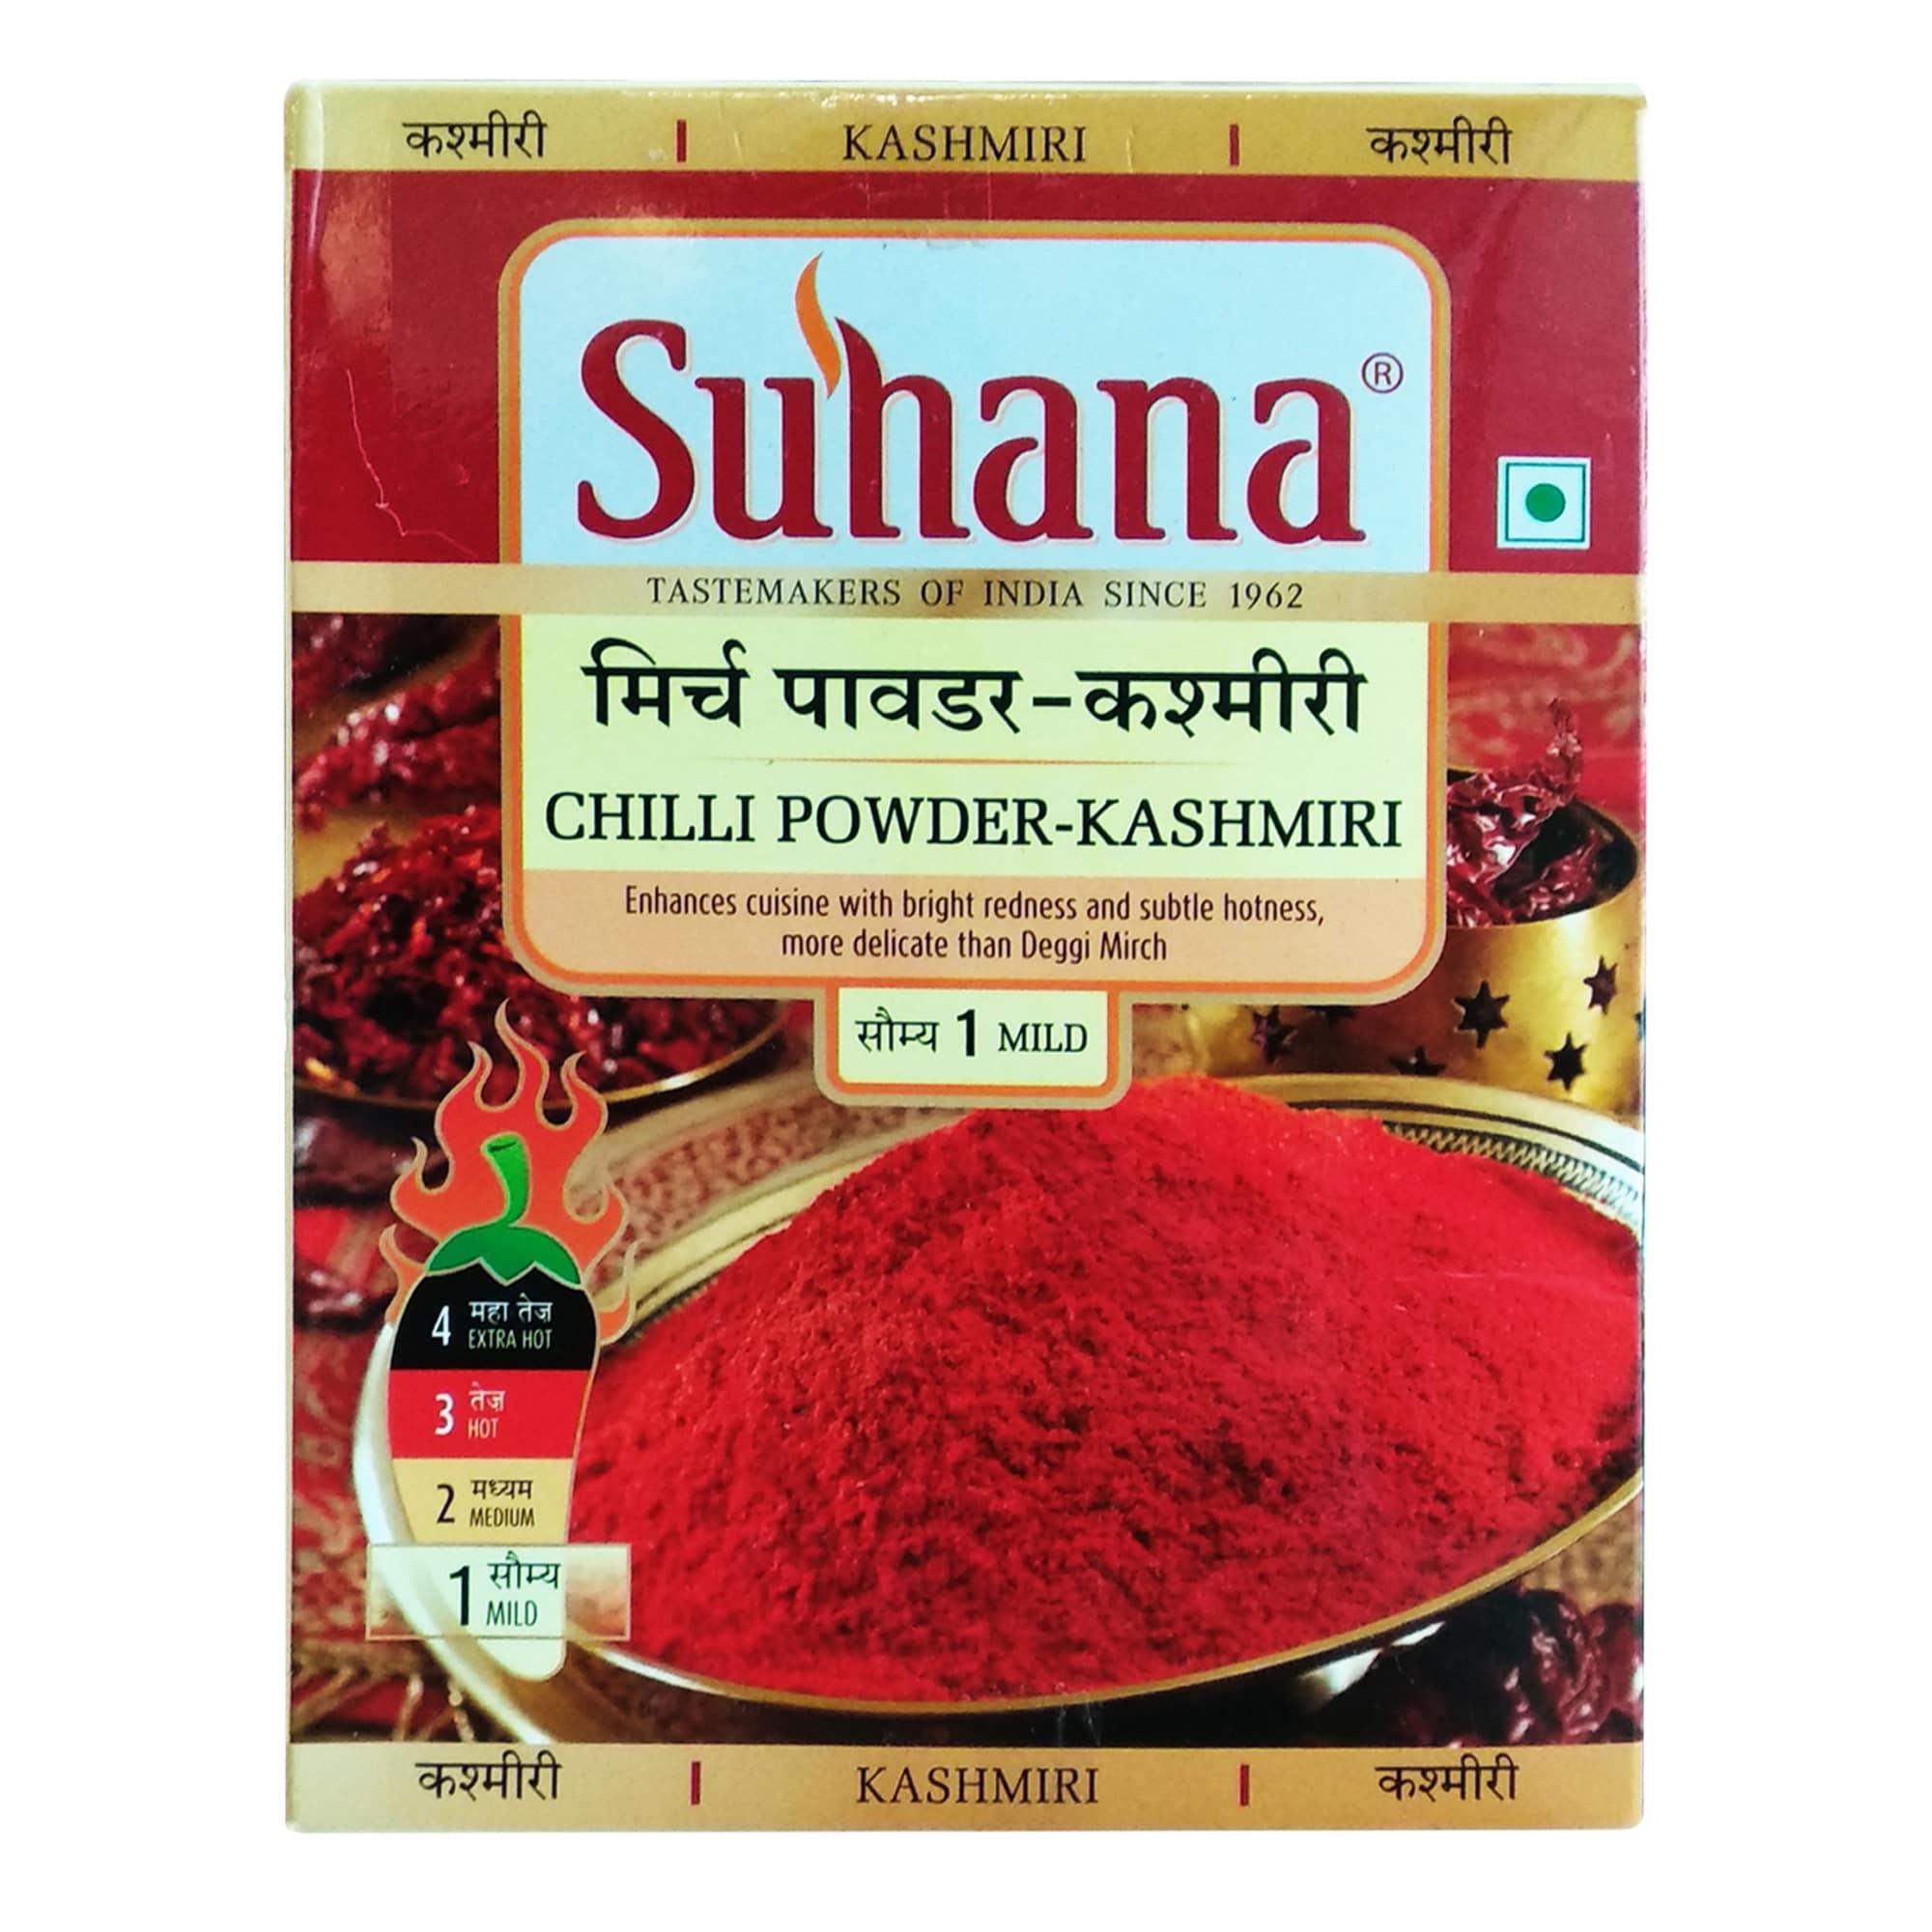 Suhana Kashmiri Chilli Powder 50g Box